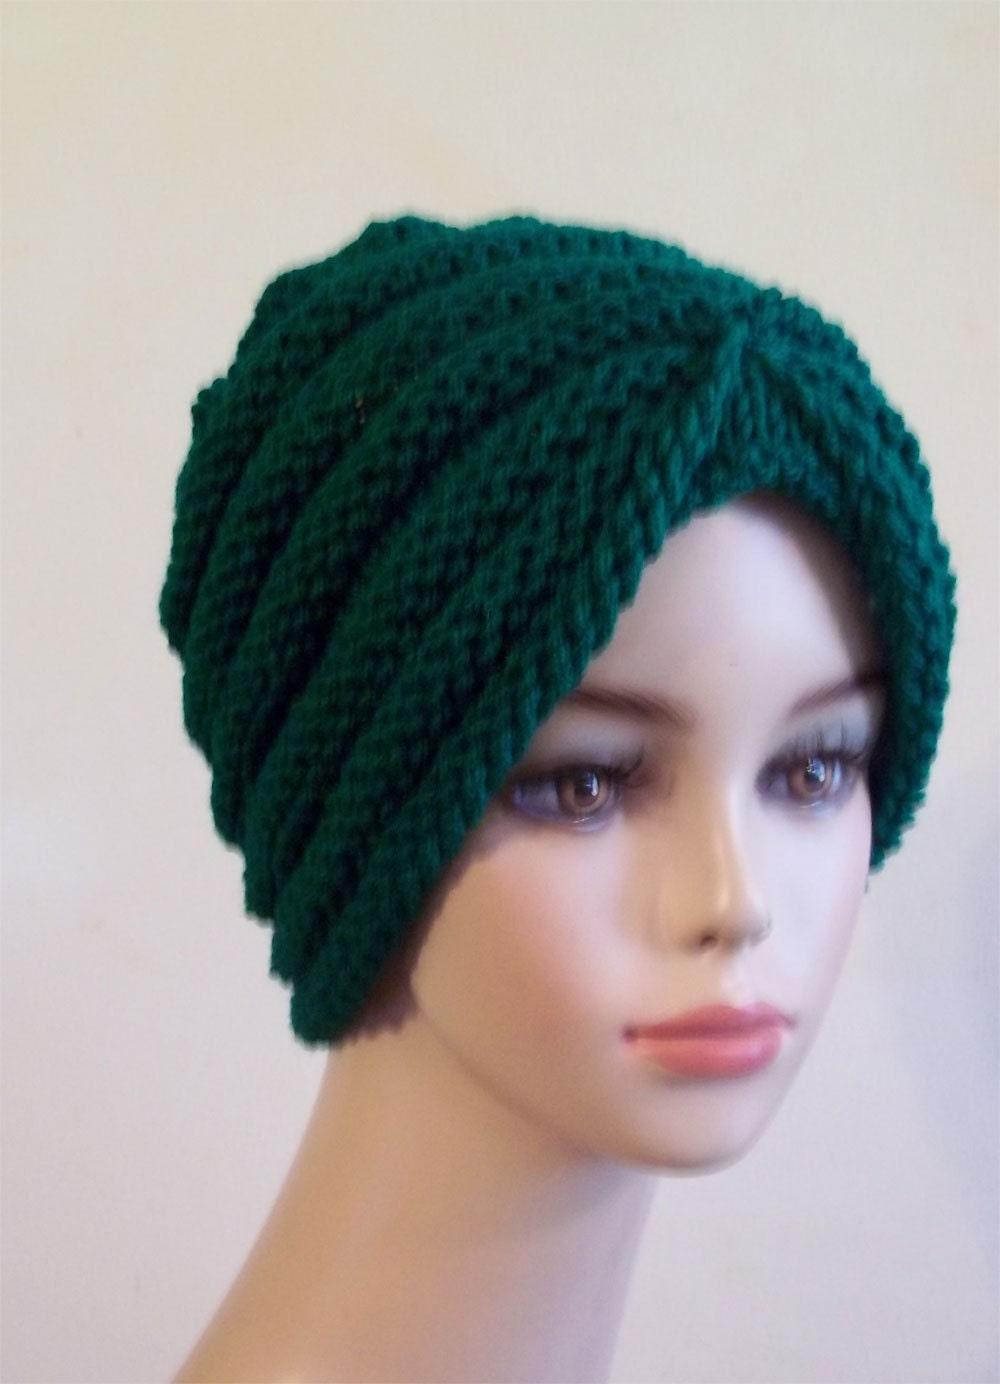 Knitted Turban Pattern Free : Knit Turban Hat Women Green